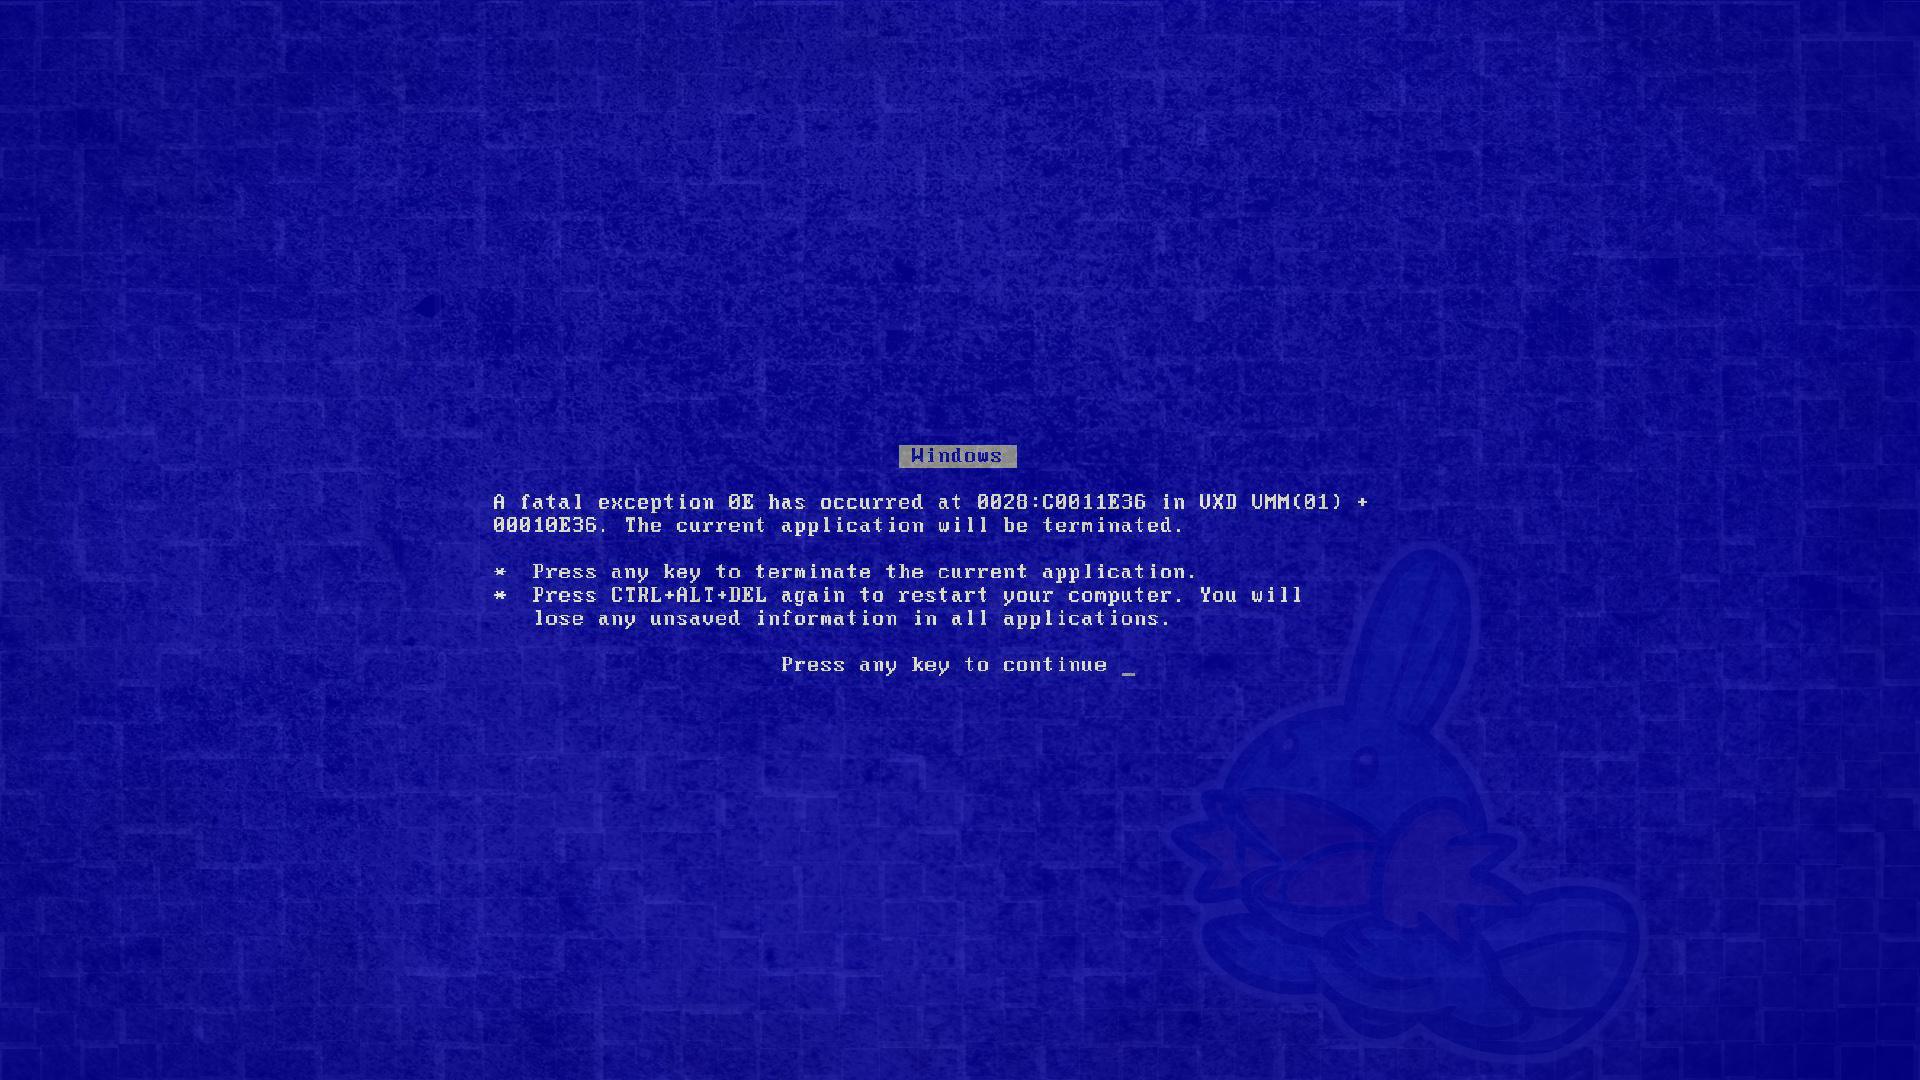 Blue Screen Wallpaper 1920x1080 Blue Screen Of Death 1920x1080